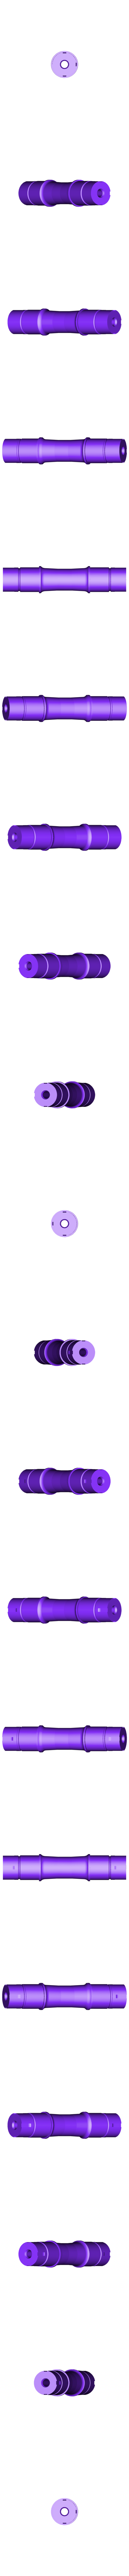 Main_Axle.STL Download free STL file 4-8-8-4 Big Boy Locomotive • 3D printer object, RaymondDeLuca